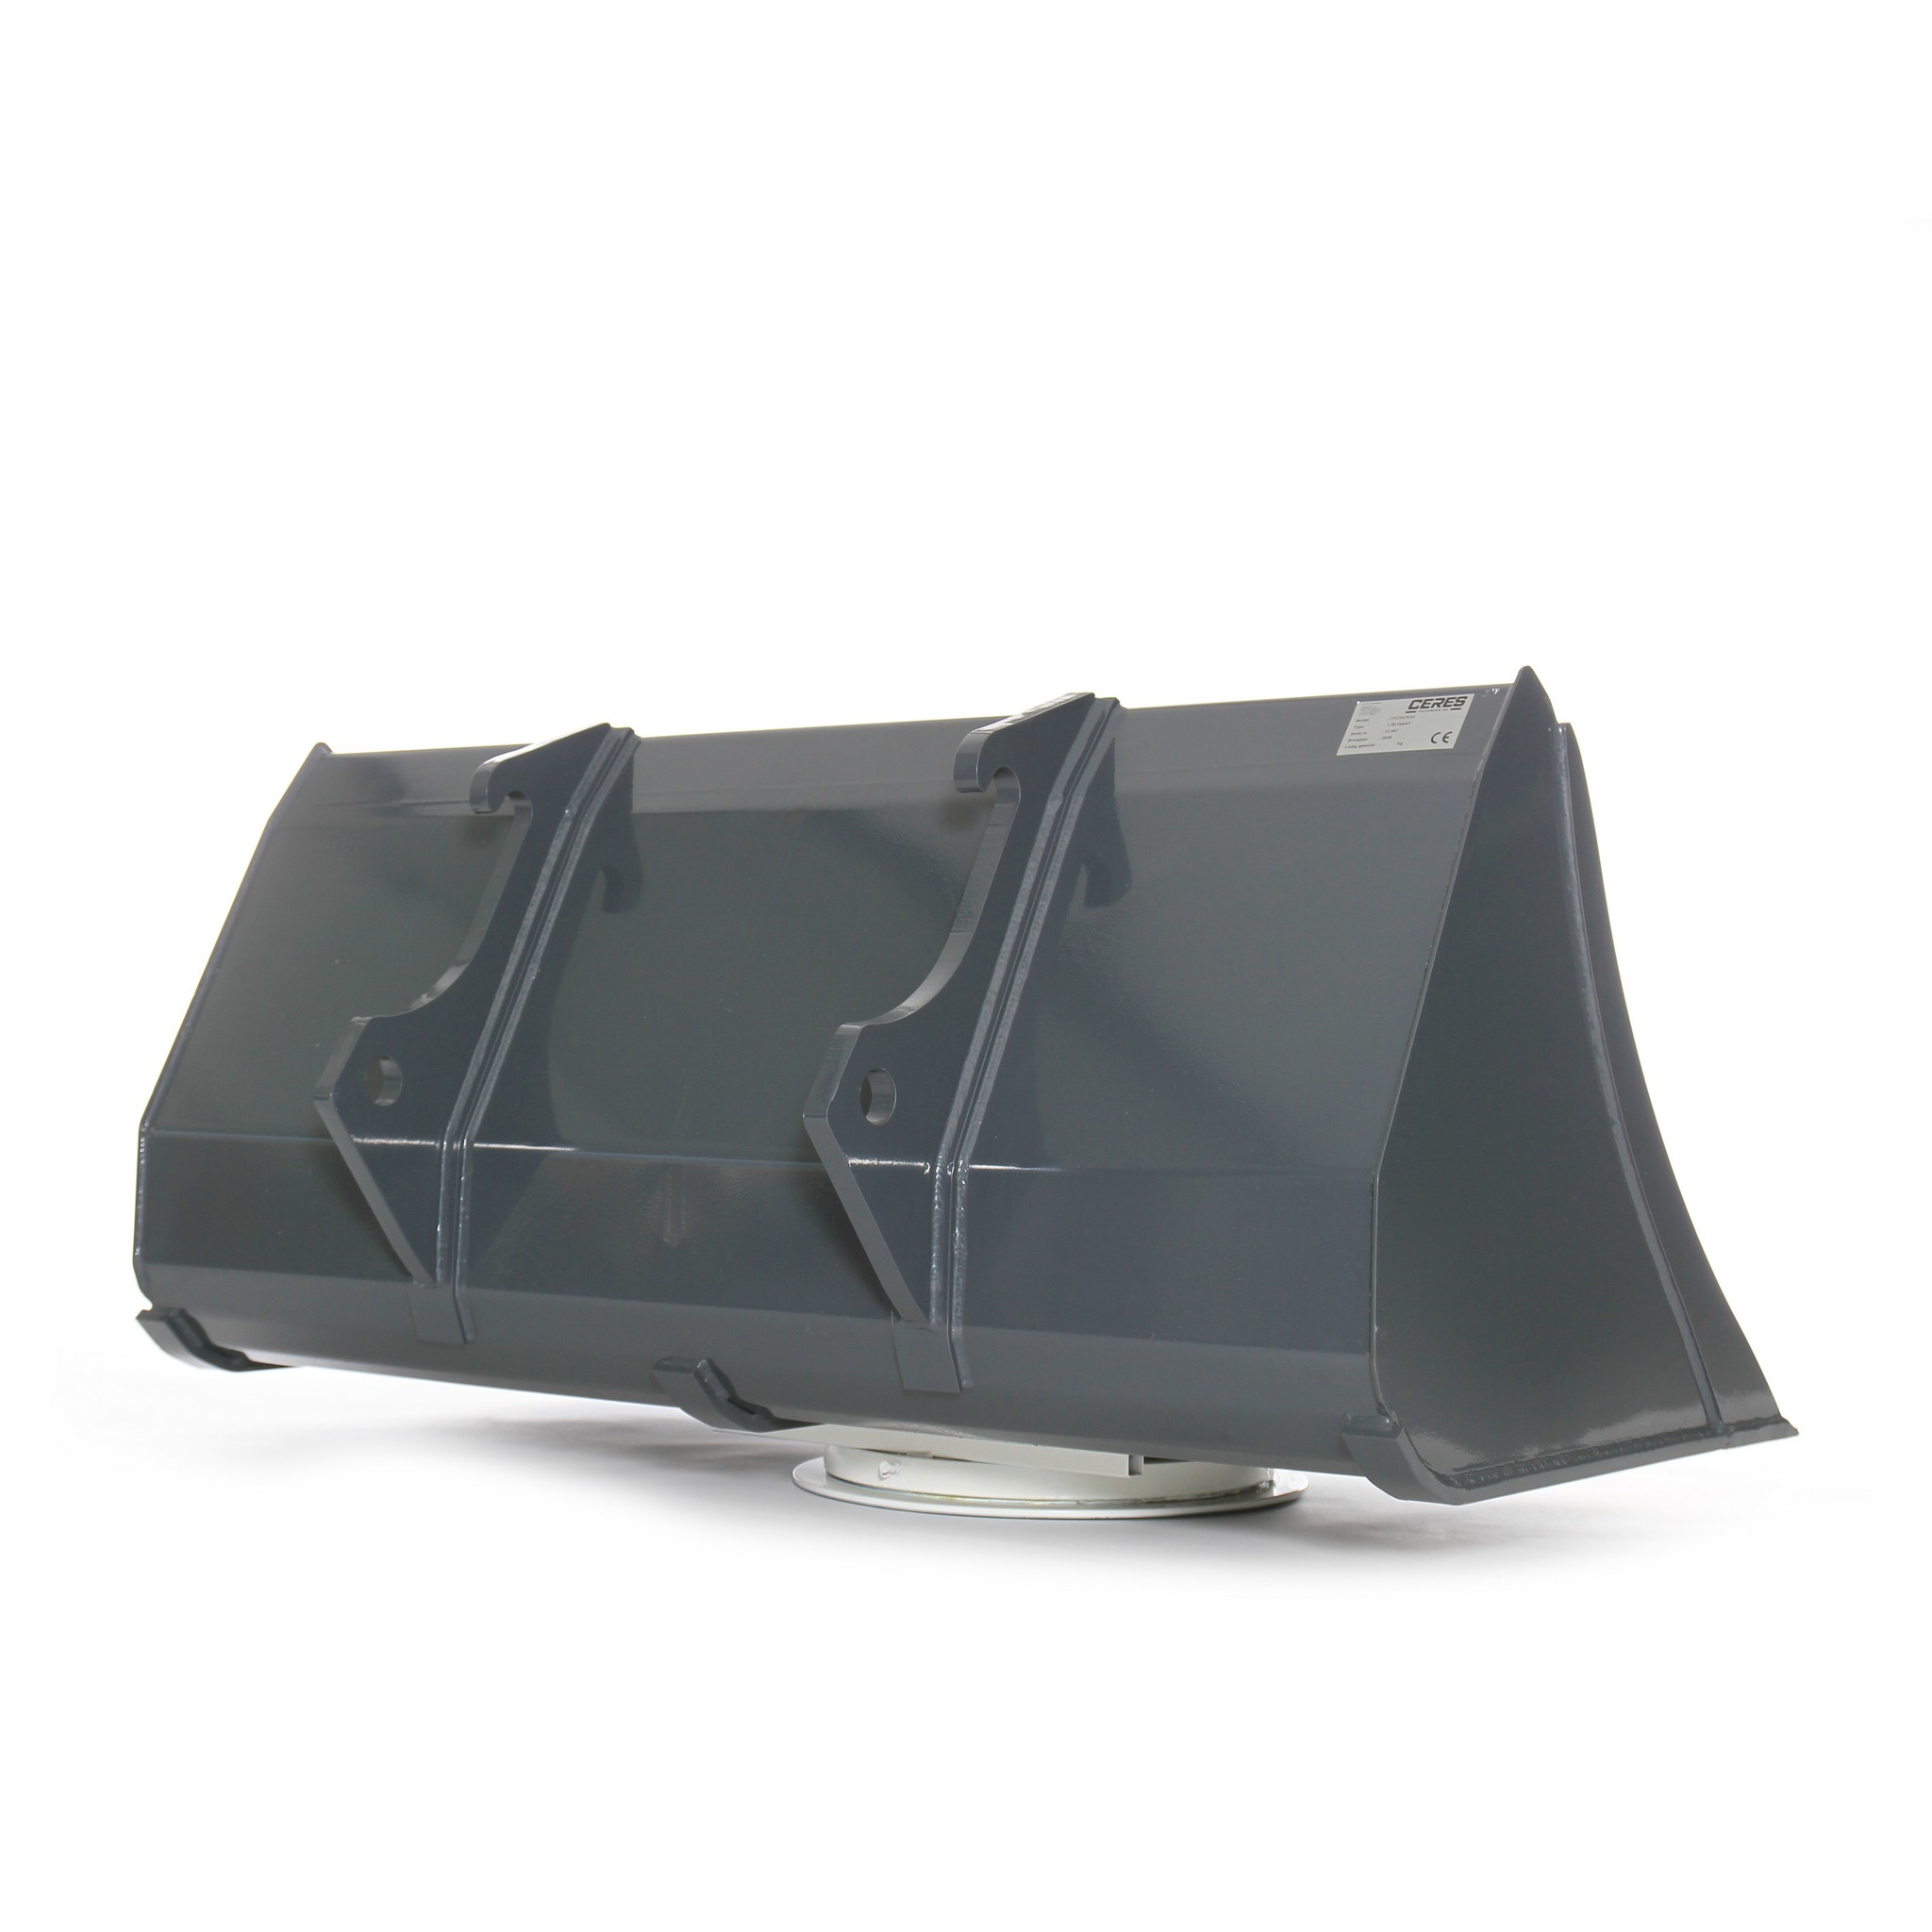 Grondbak minishovel CGB-M-G passend op Giant